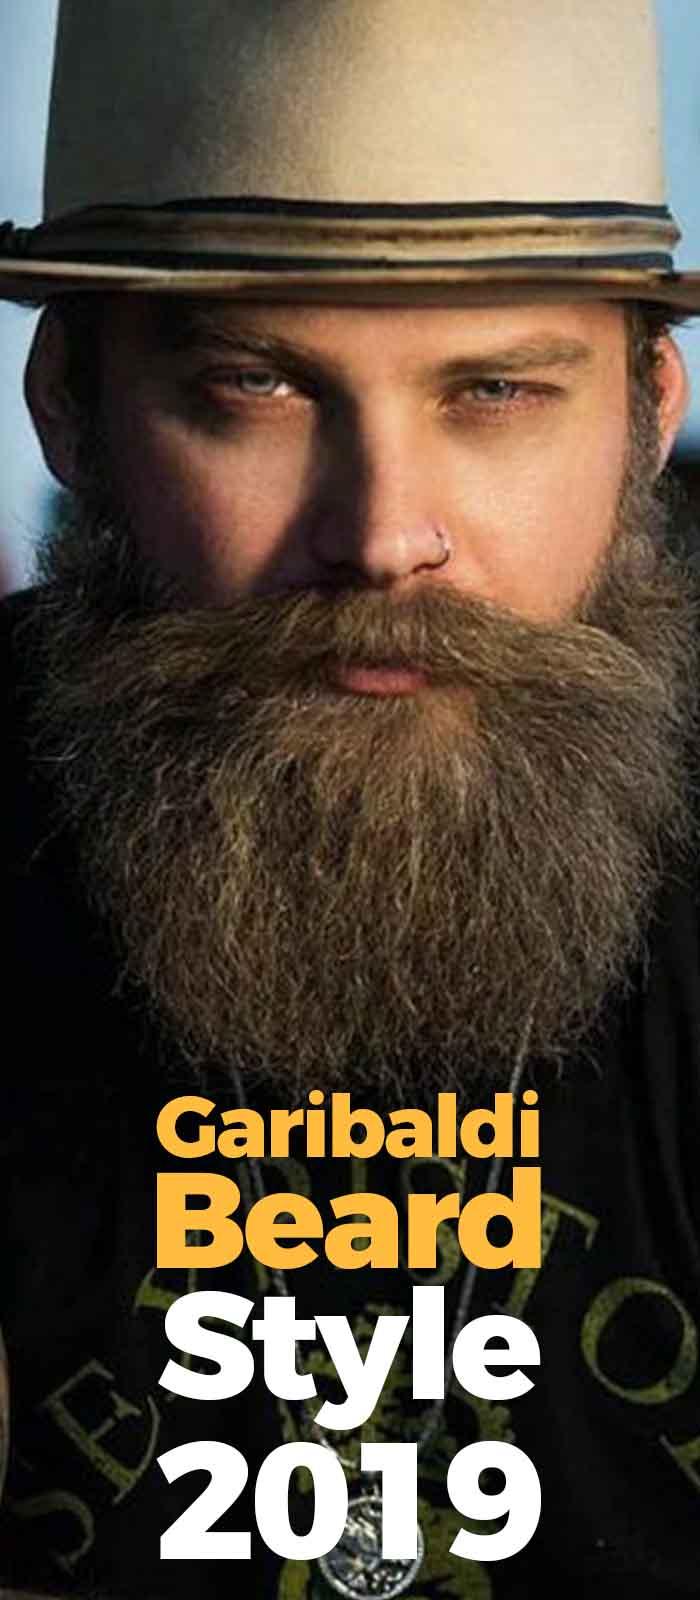 Garibaldi Beard for men to style!